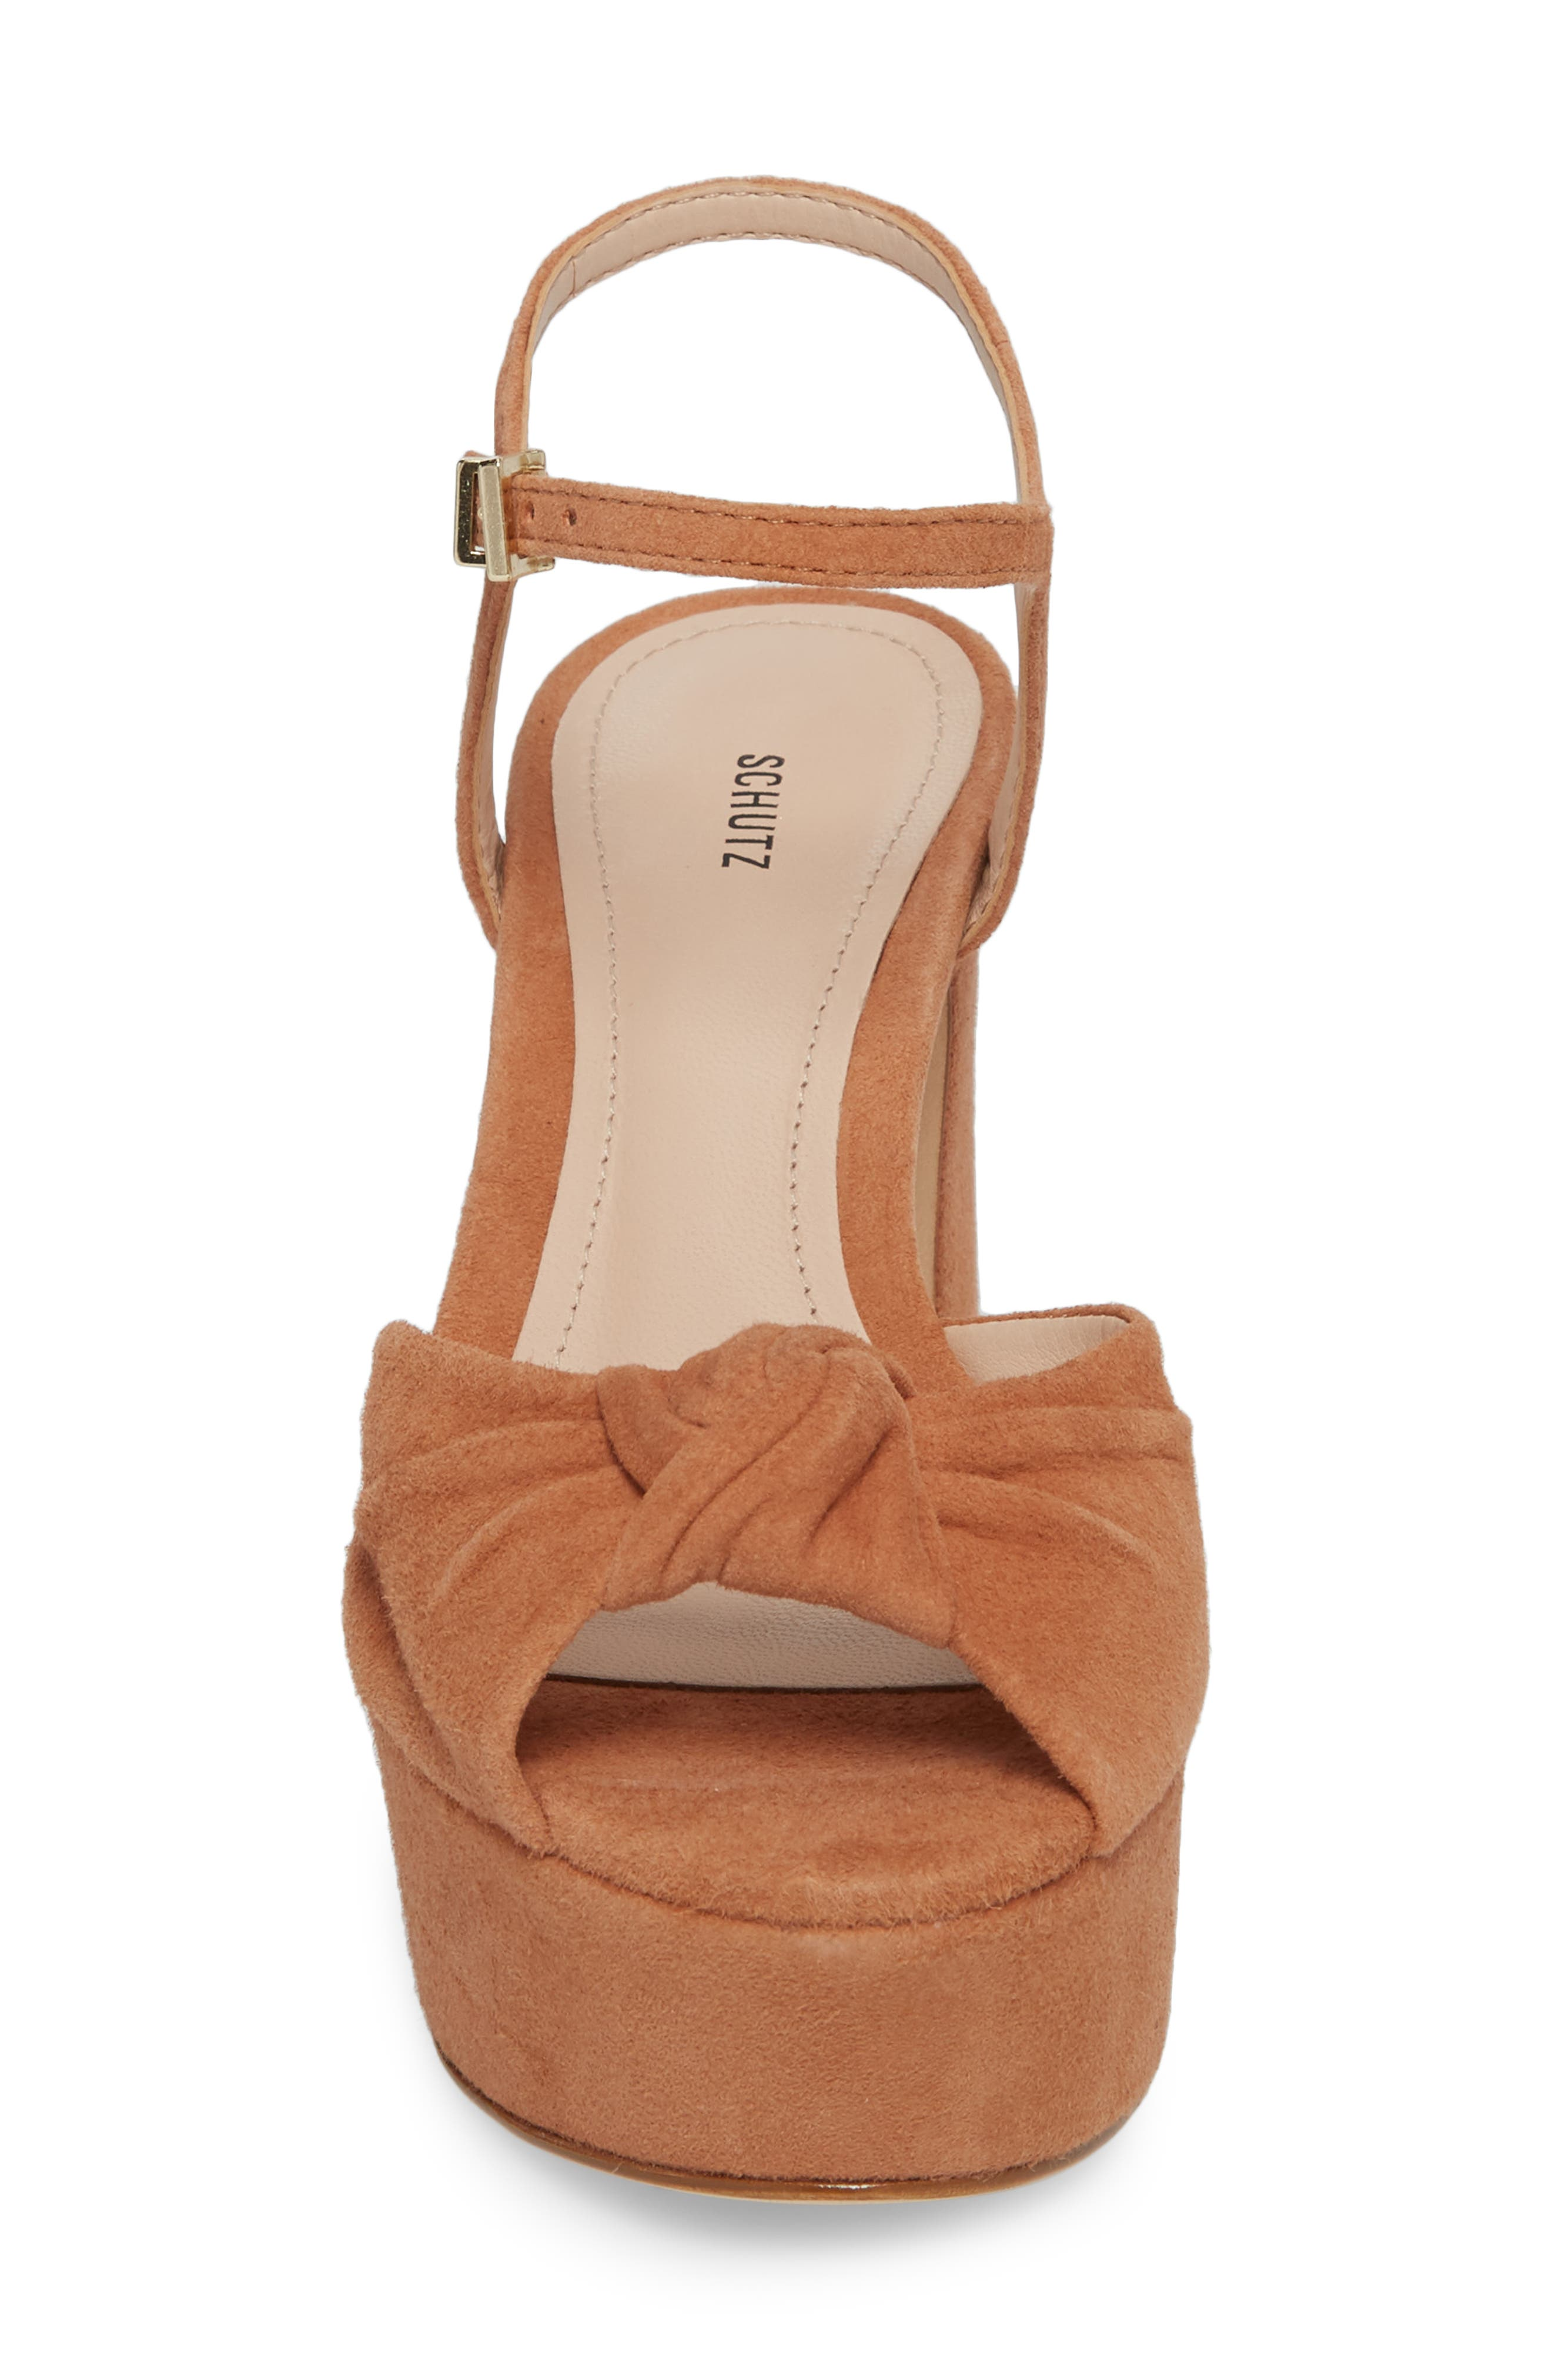 Thalyta Platform Sandal,                             Alternate thumbnail 4, color,                             Toasted Nut